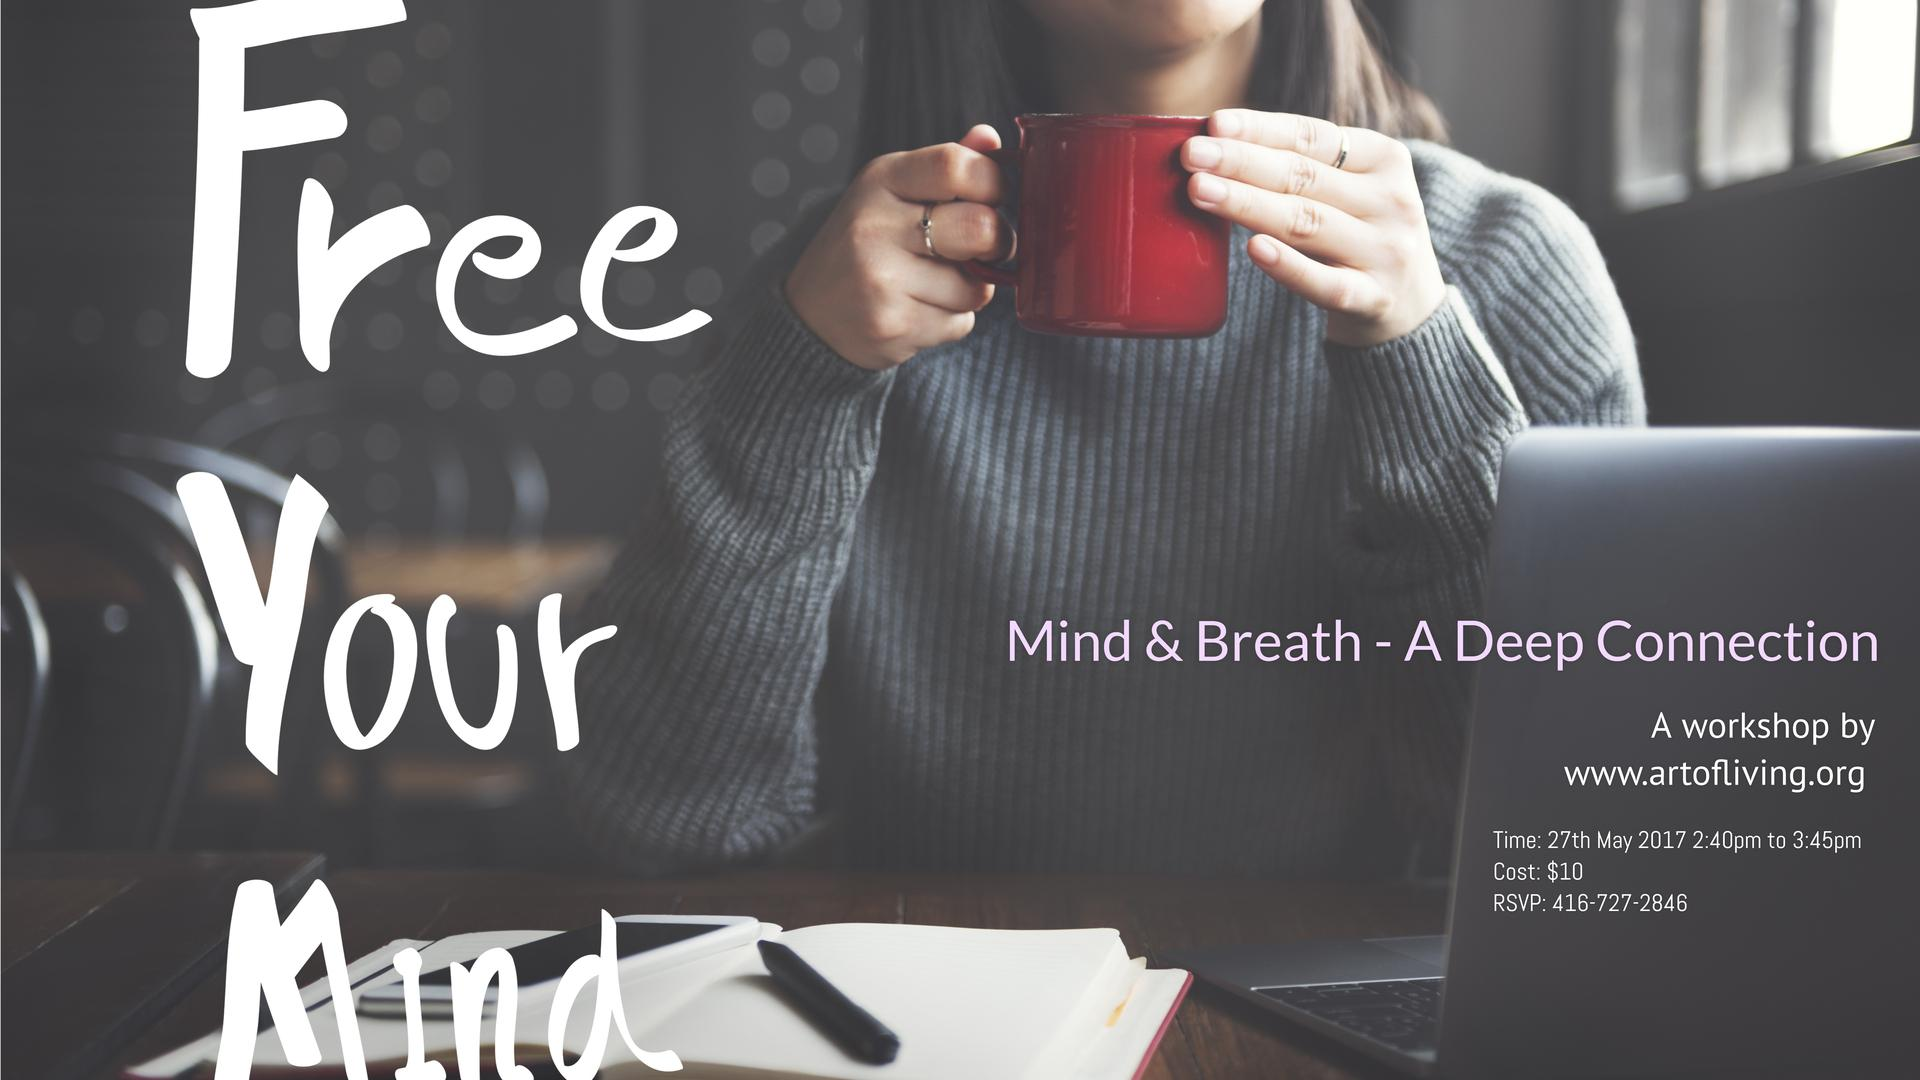 Mind & Breath - A Deep Connection